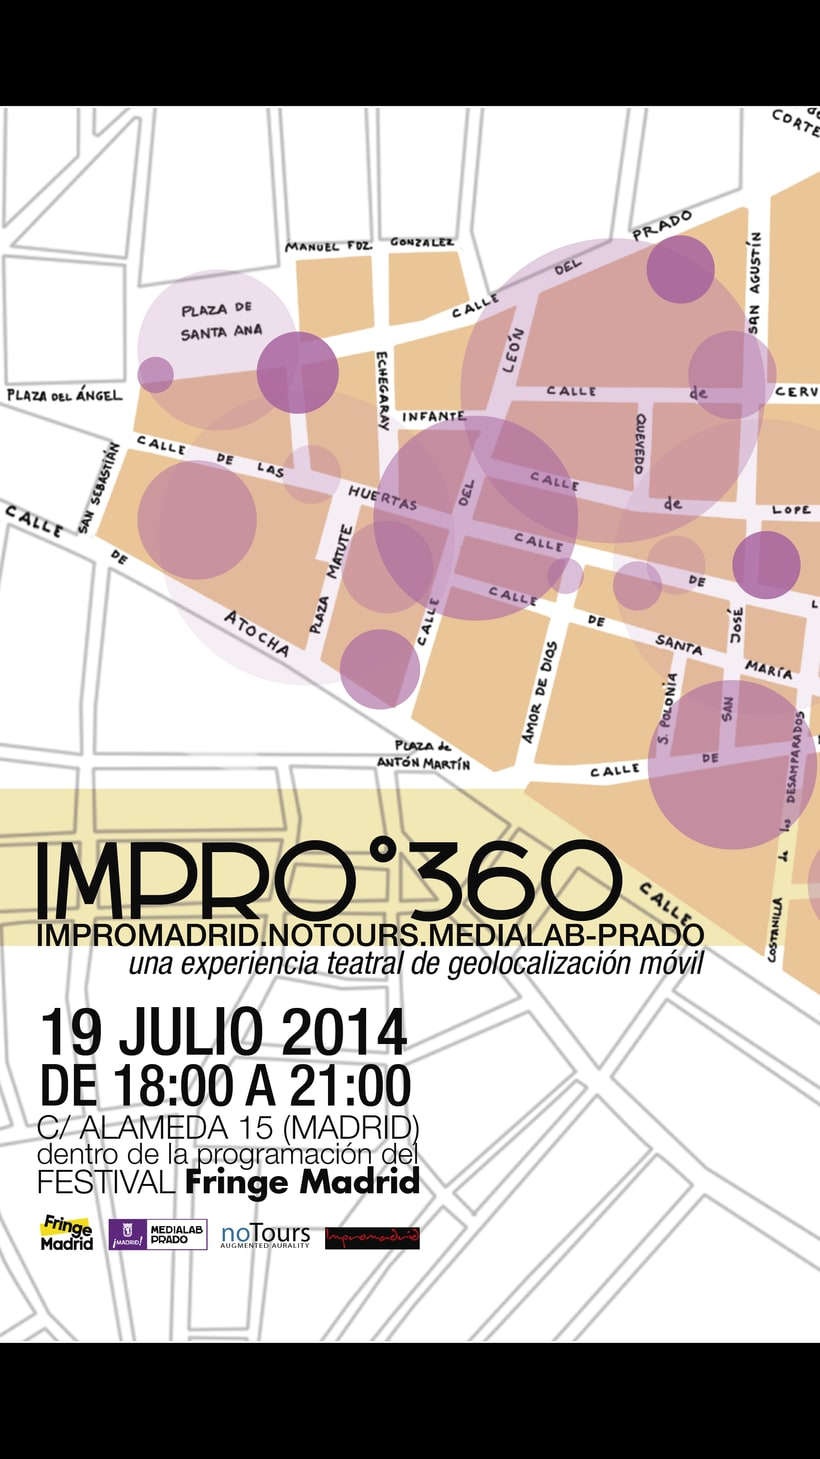 IMPRO 360_medialabprado 1